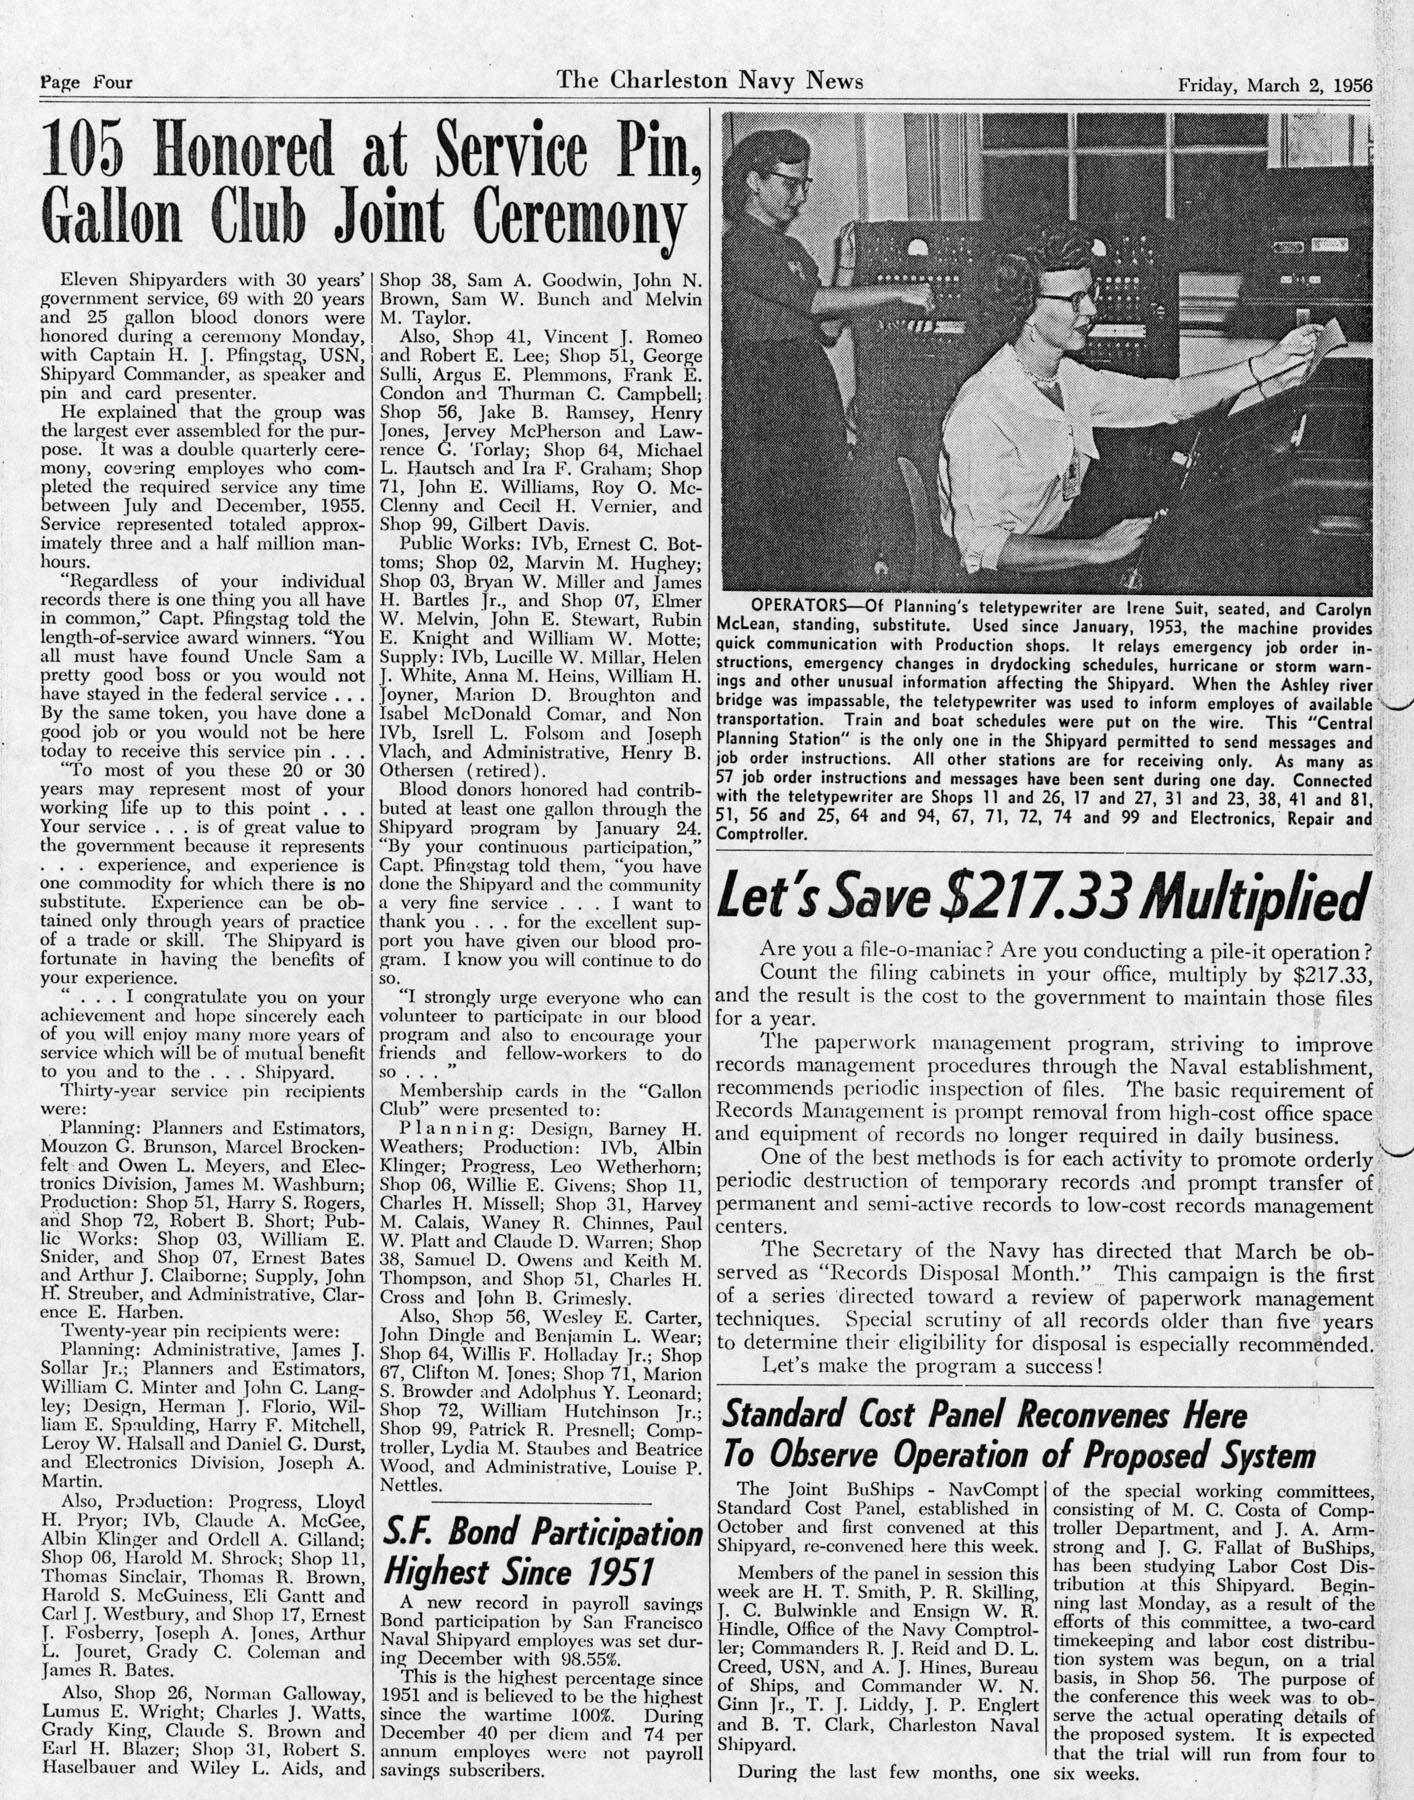 The Charleston Navy News, Volume 14, Edition 16, page iv